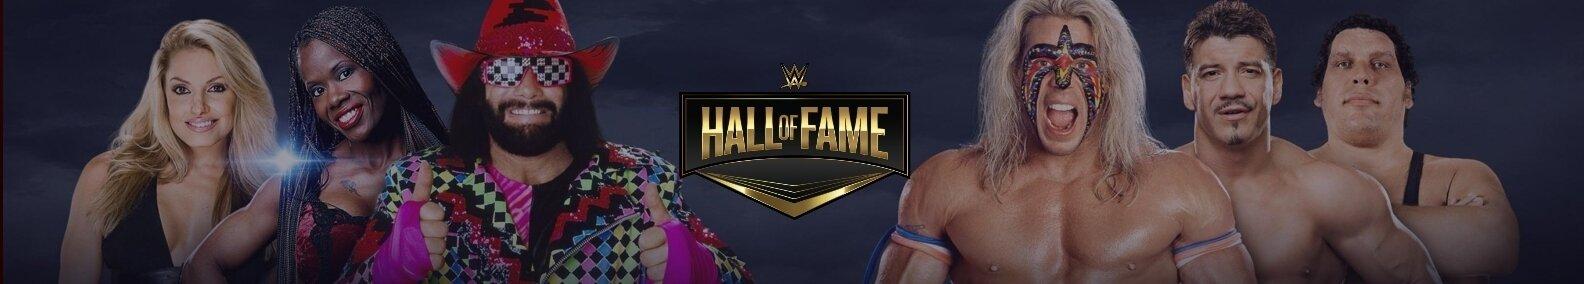 WWE HALL OF FAME 2020 : Les Têtes d'affiche sont connues !